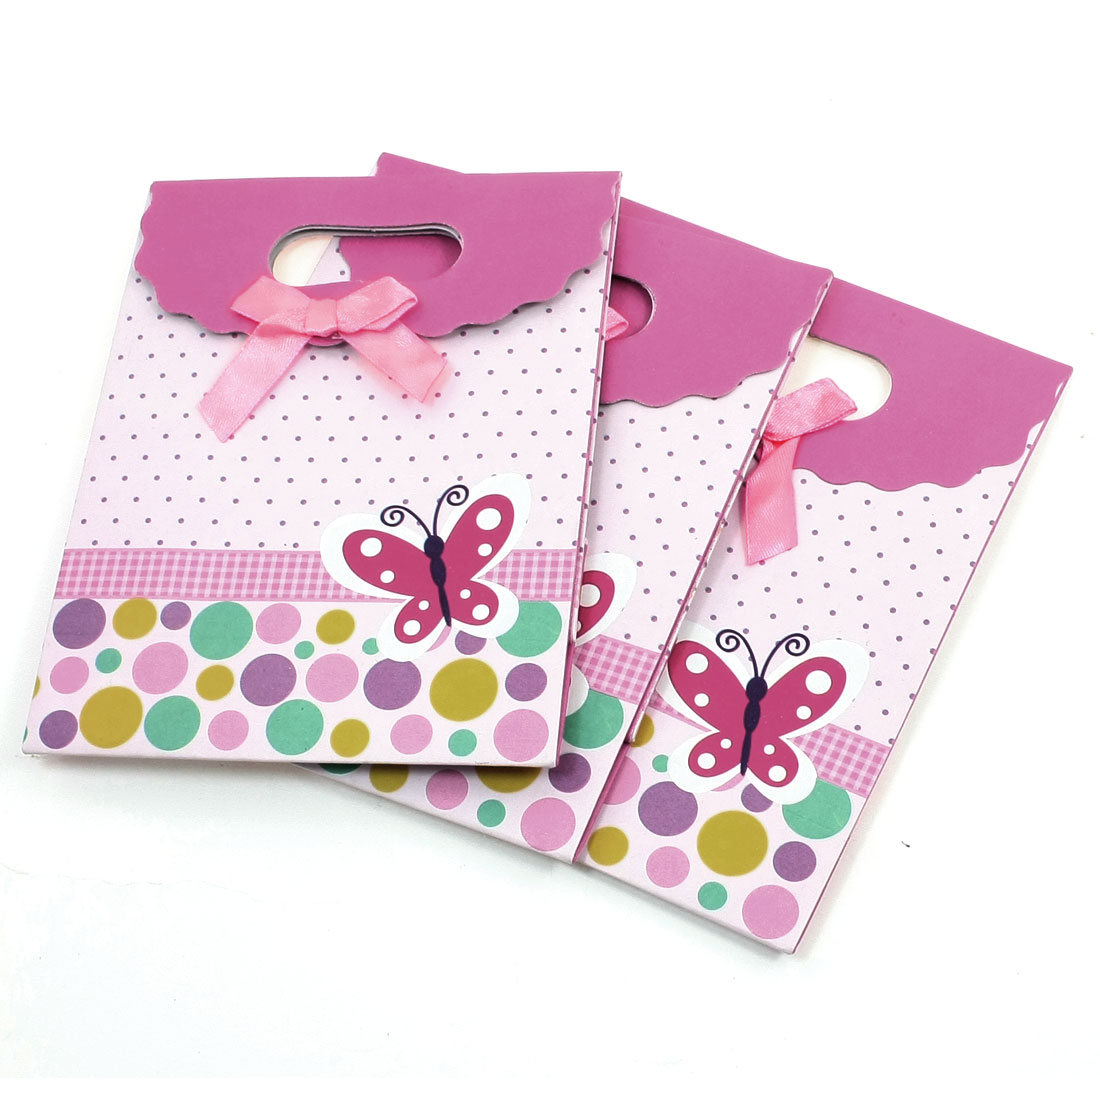 3 Pcs Dots Printed Bowknot Fuchsia Foldable Gift Bag Storage Case